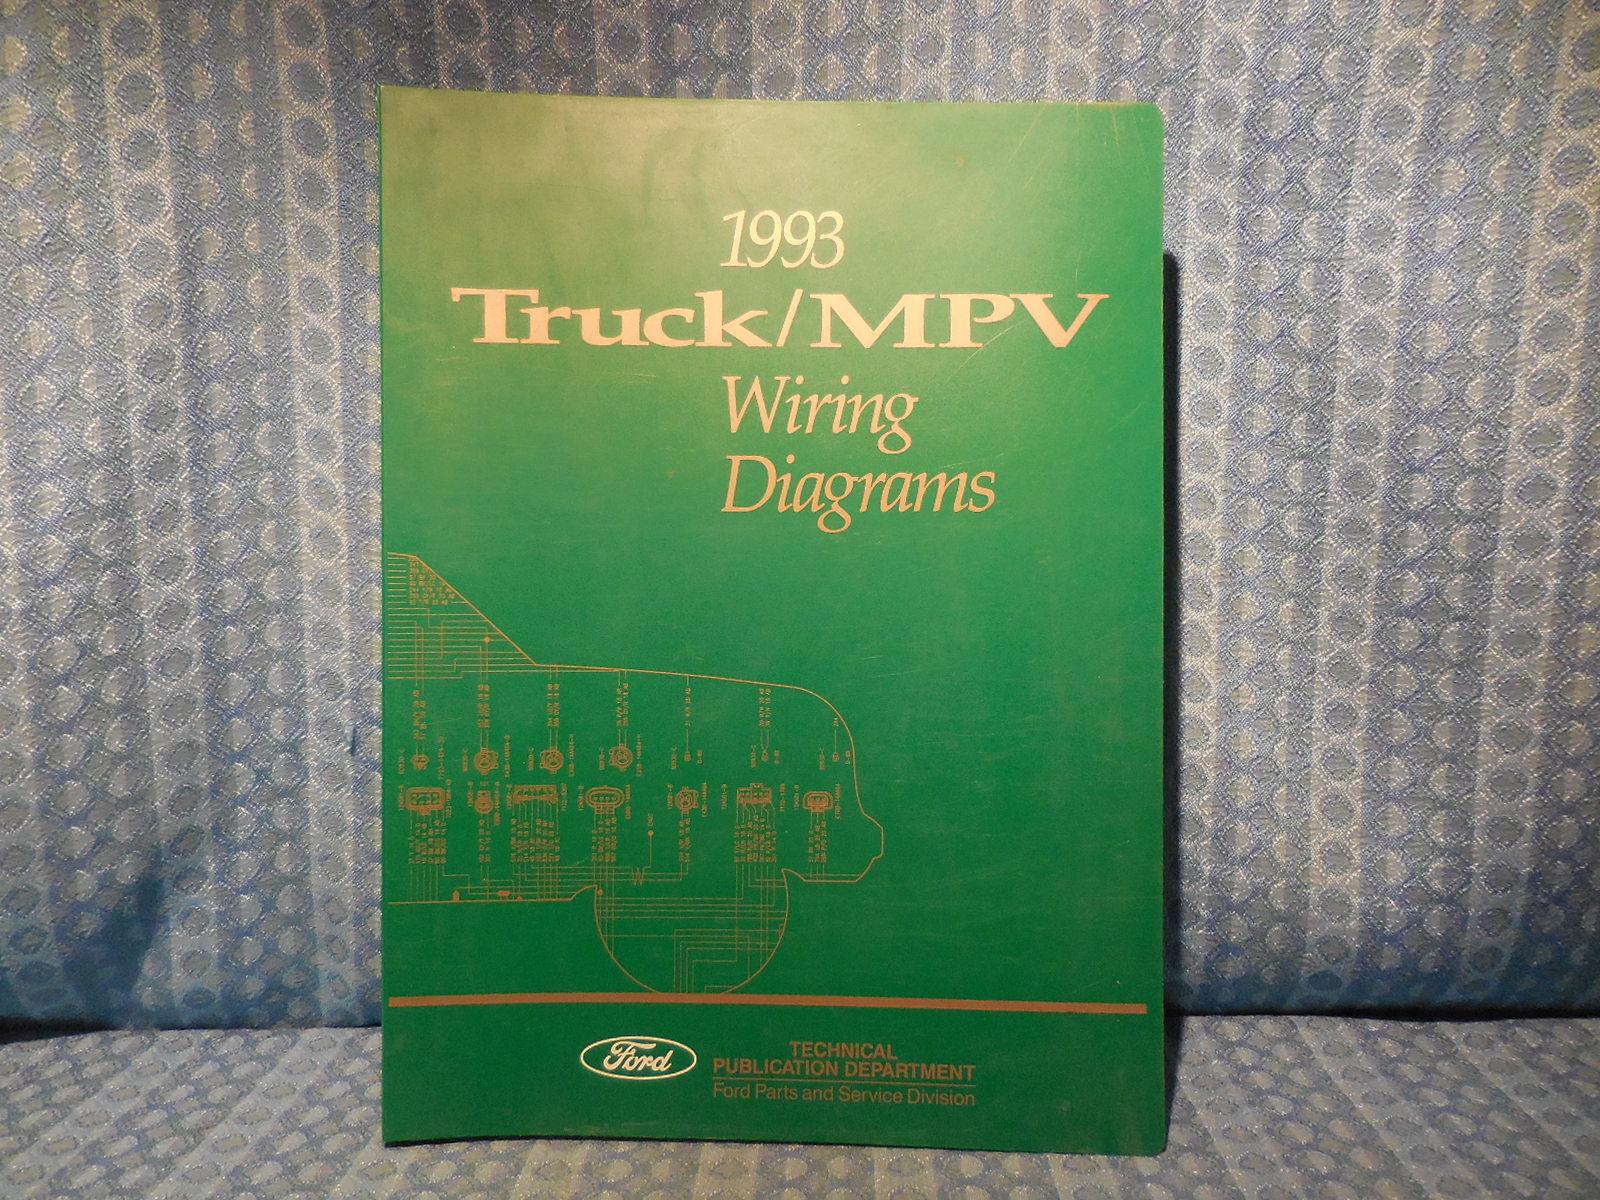 Regulator Wiring Diagram As Well 1993 Ford Wiper Motor Wiring Diagrams